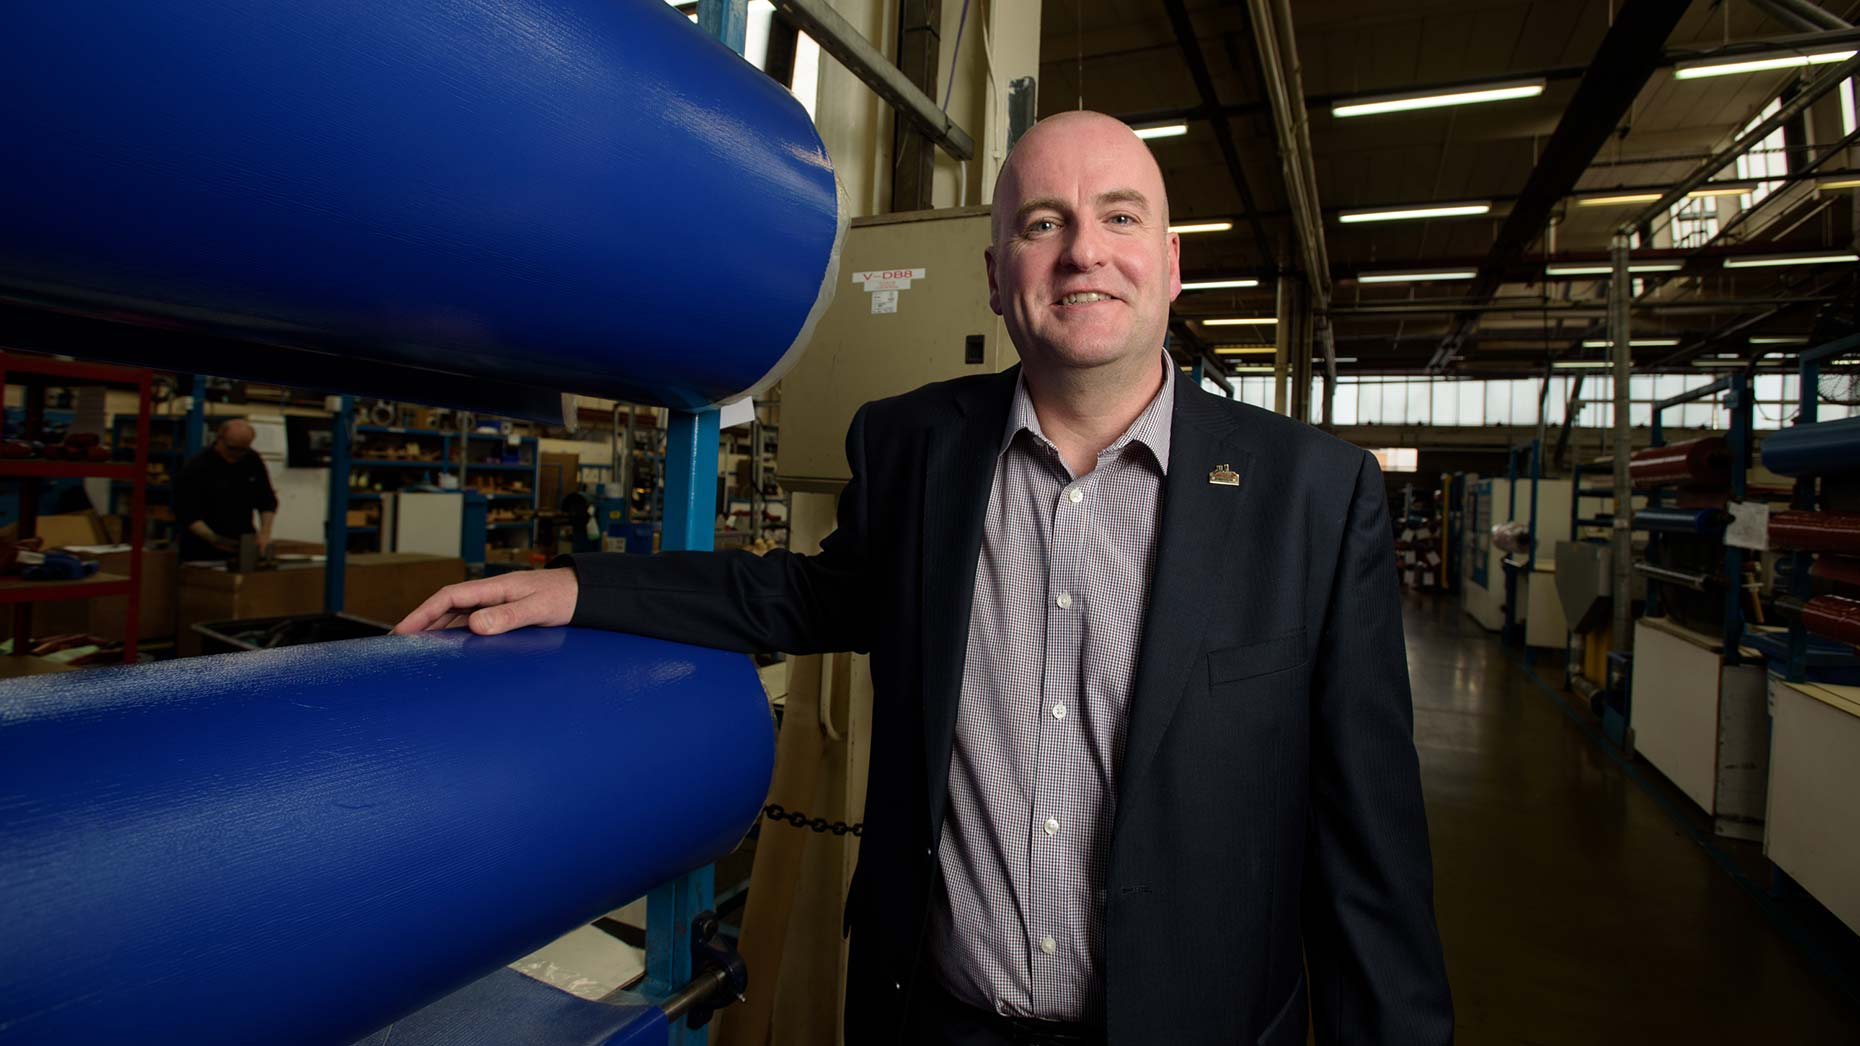 Paul Edwards, Managing Director of James Dawson & Son. Photo Steve Smailes